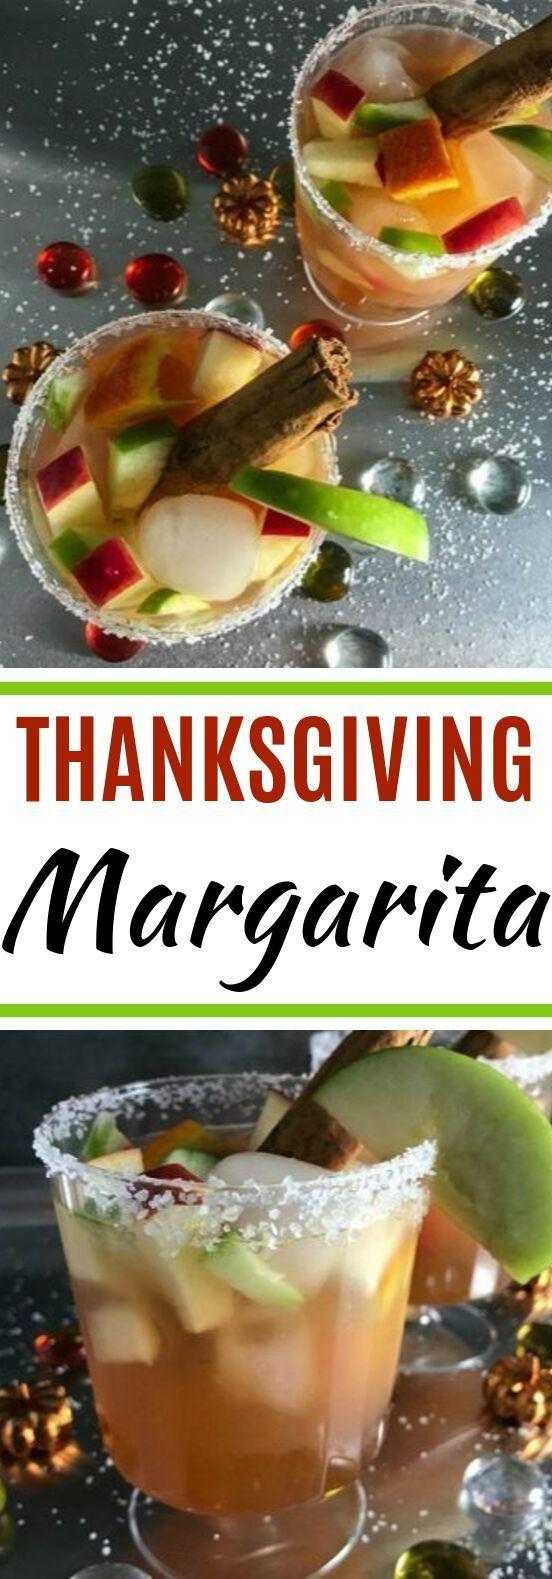 Thanksgiving Margaritas #drinks #alcohol #margarita #cocktails #christmas #thanksgivingdrinksalcohol